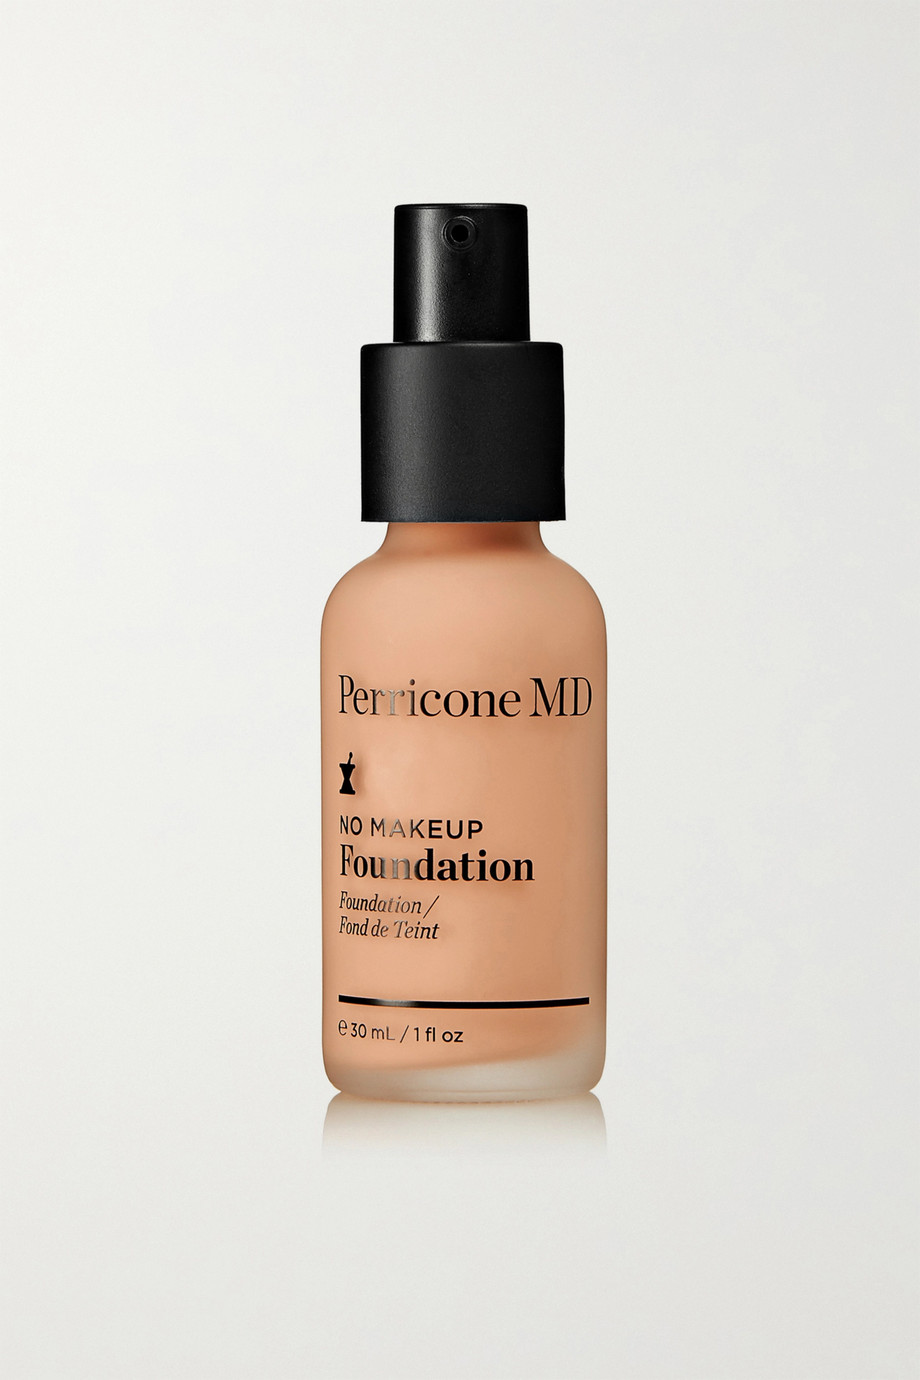 Perricone MD Fond de teint No Makeup à large spectre SPF 20, Buff, 30 ml